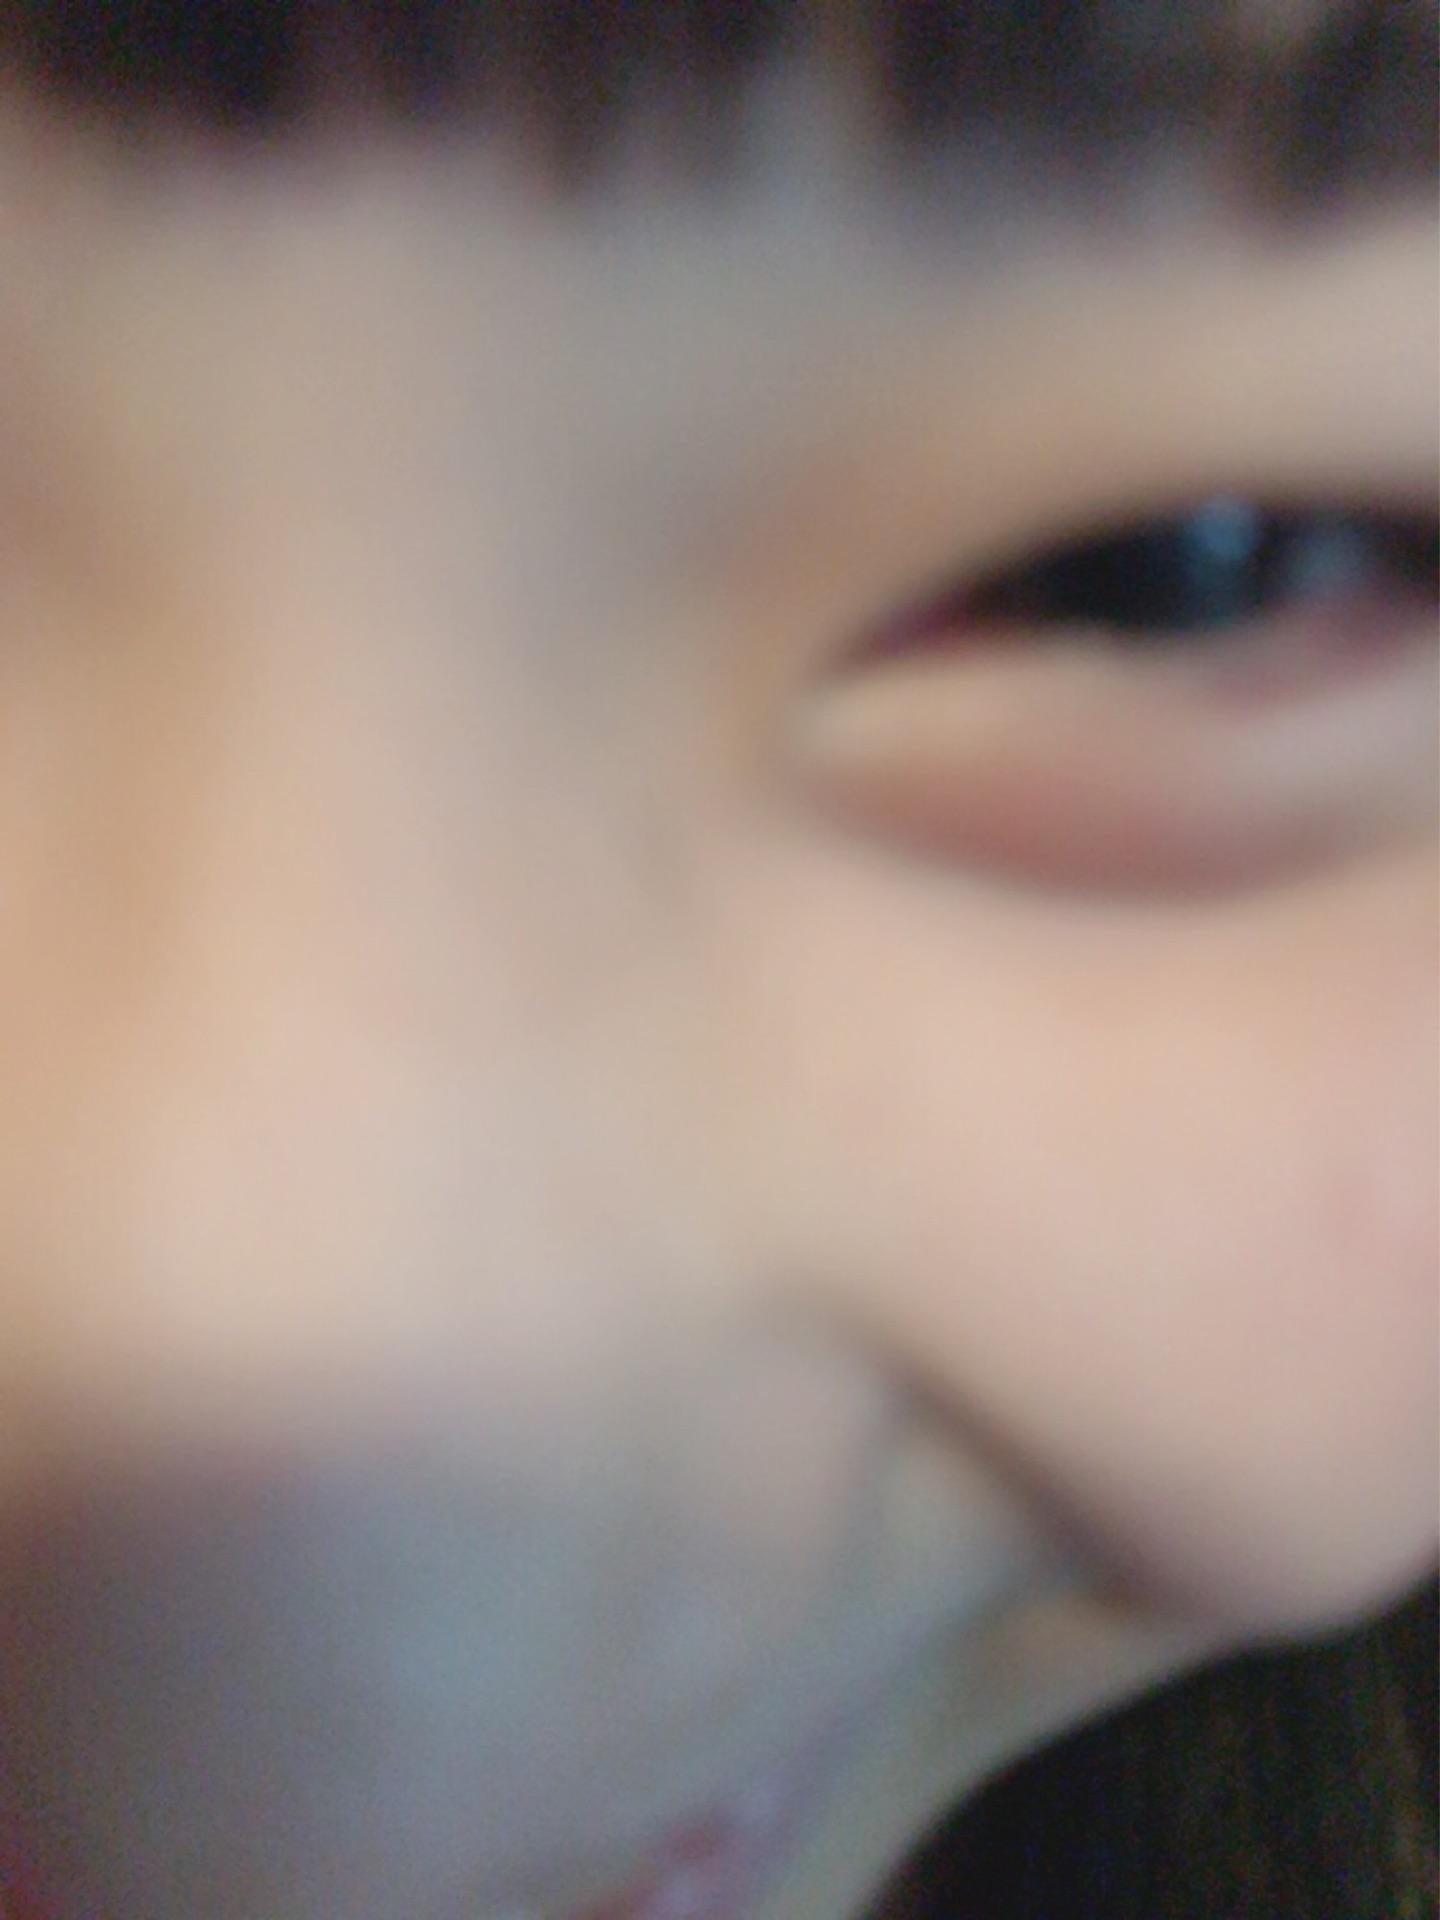 【SKE48 8期研究生】渥美彩羽応援スレッド★1【あや】 [無断転載禁止]©2ch.netYouTube動画>14本 ->画像>634枚